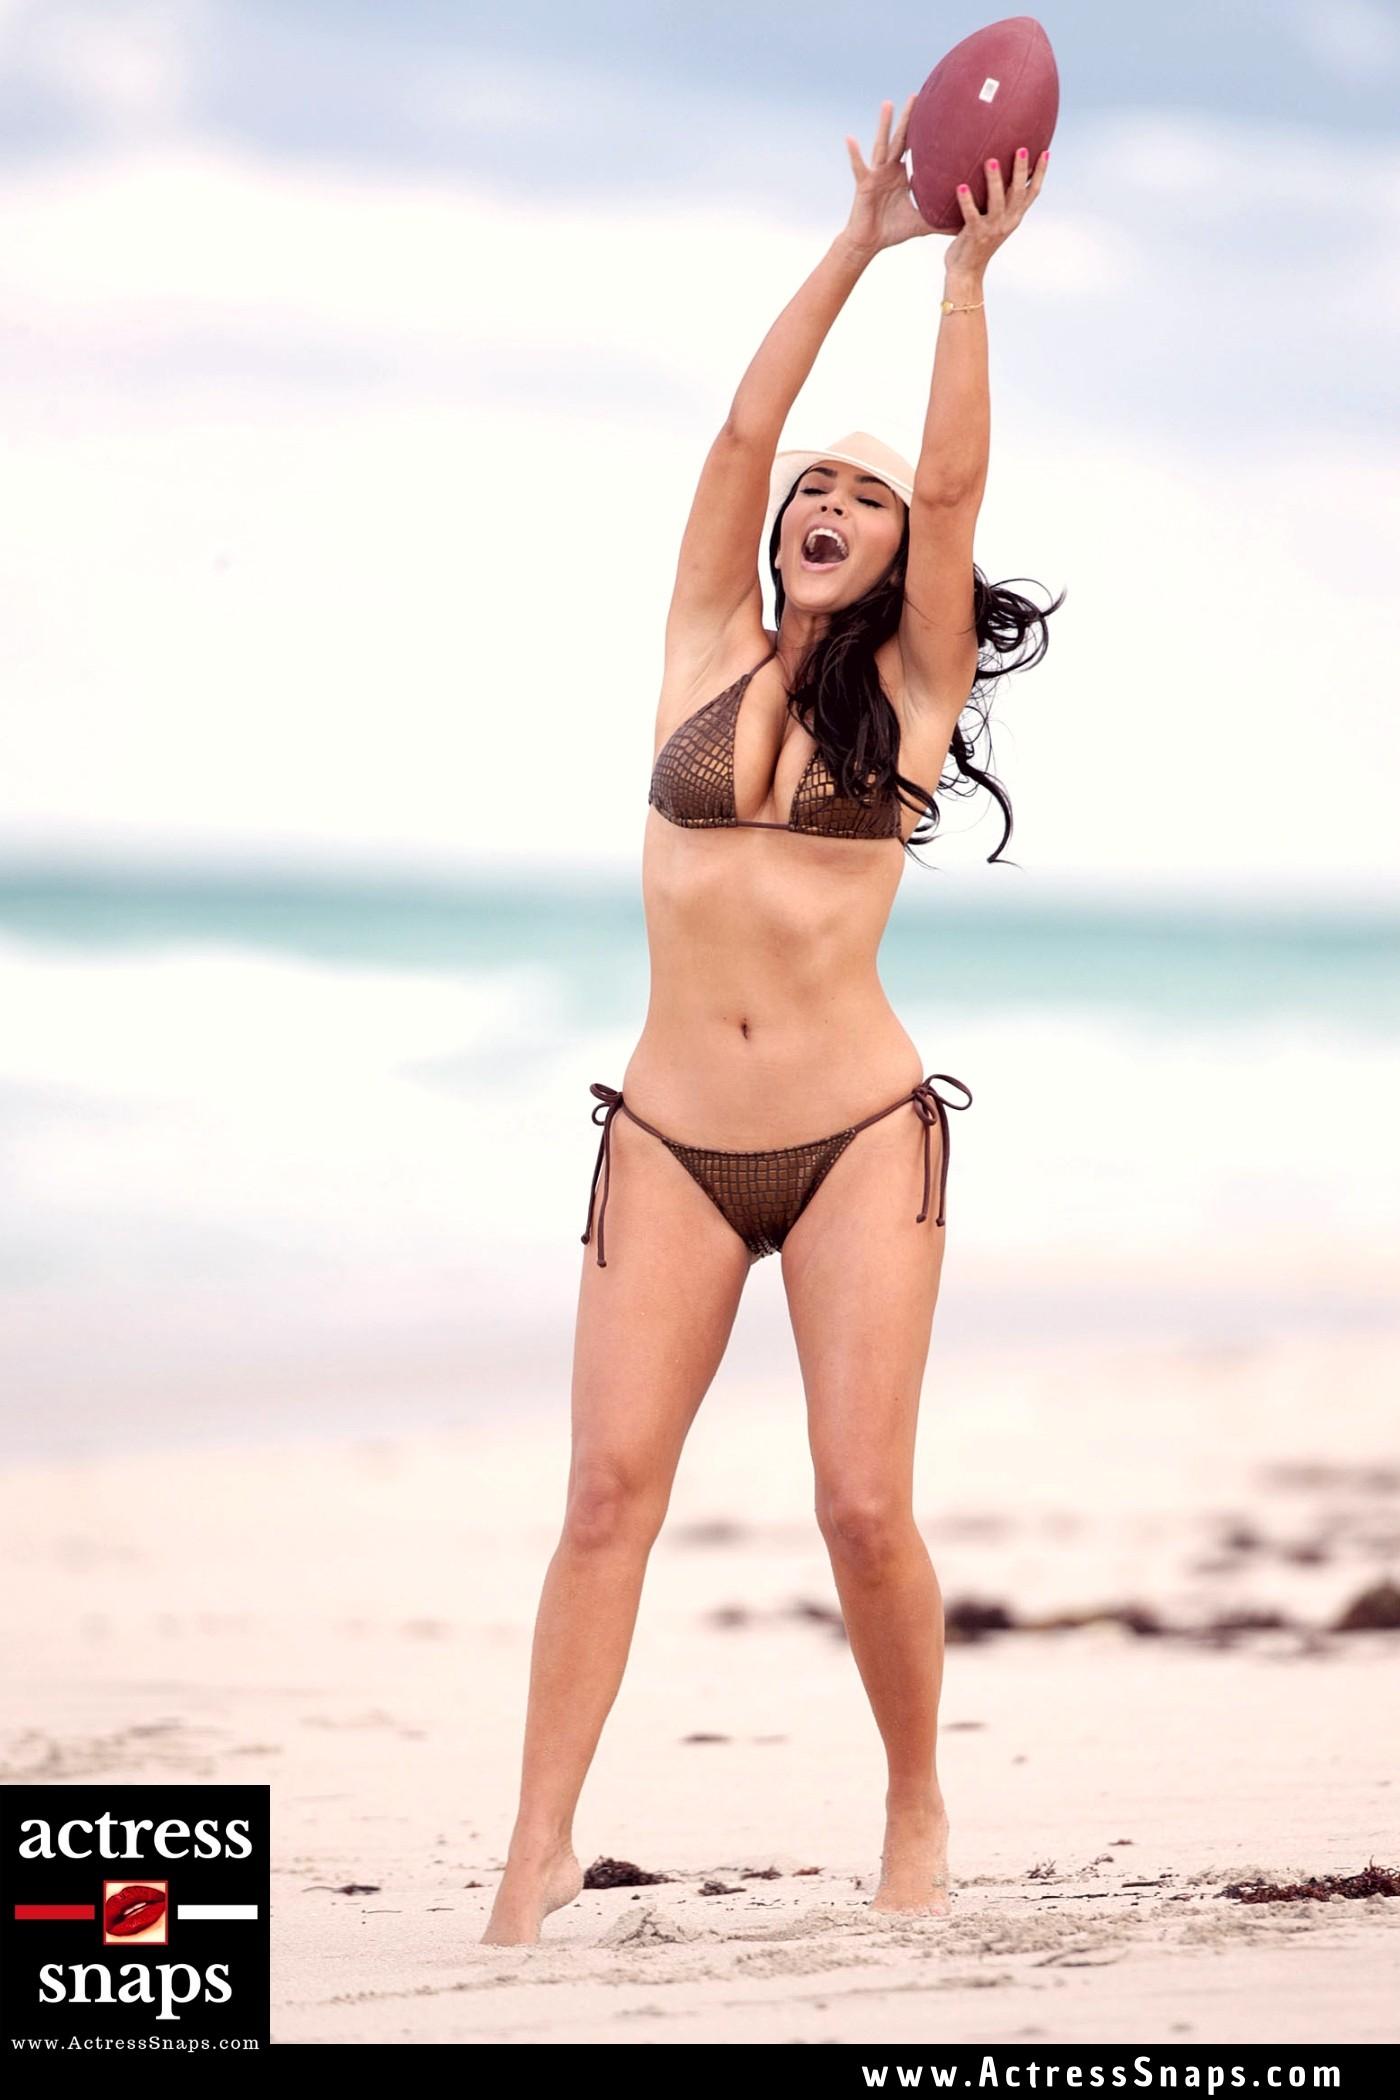 Sexy Kim Kardashian Beach Candids - Sexy Actress Pictures   Hot Actress Pictures - ActressSnaps.com